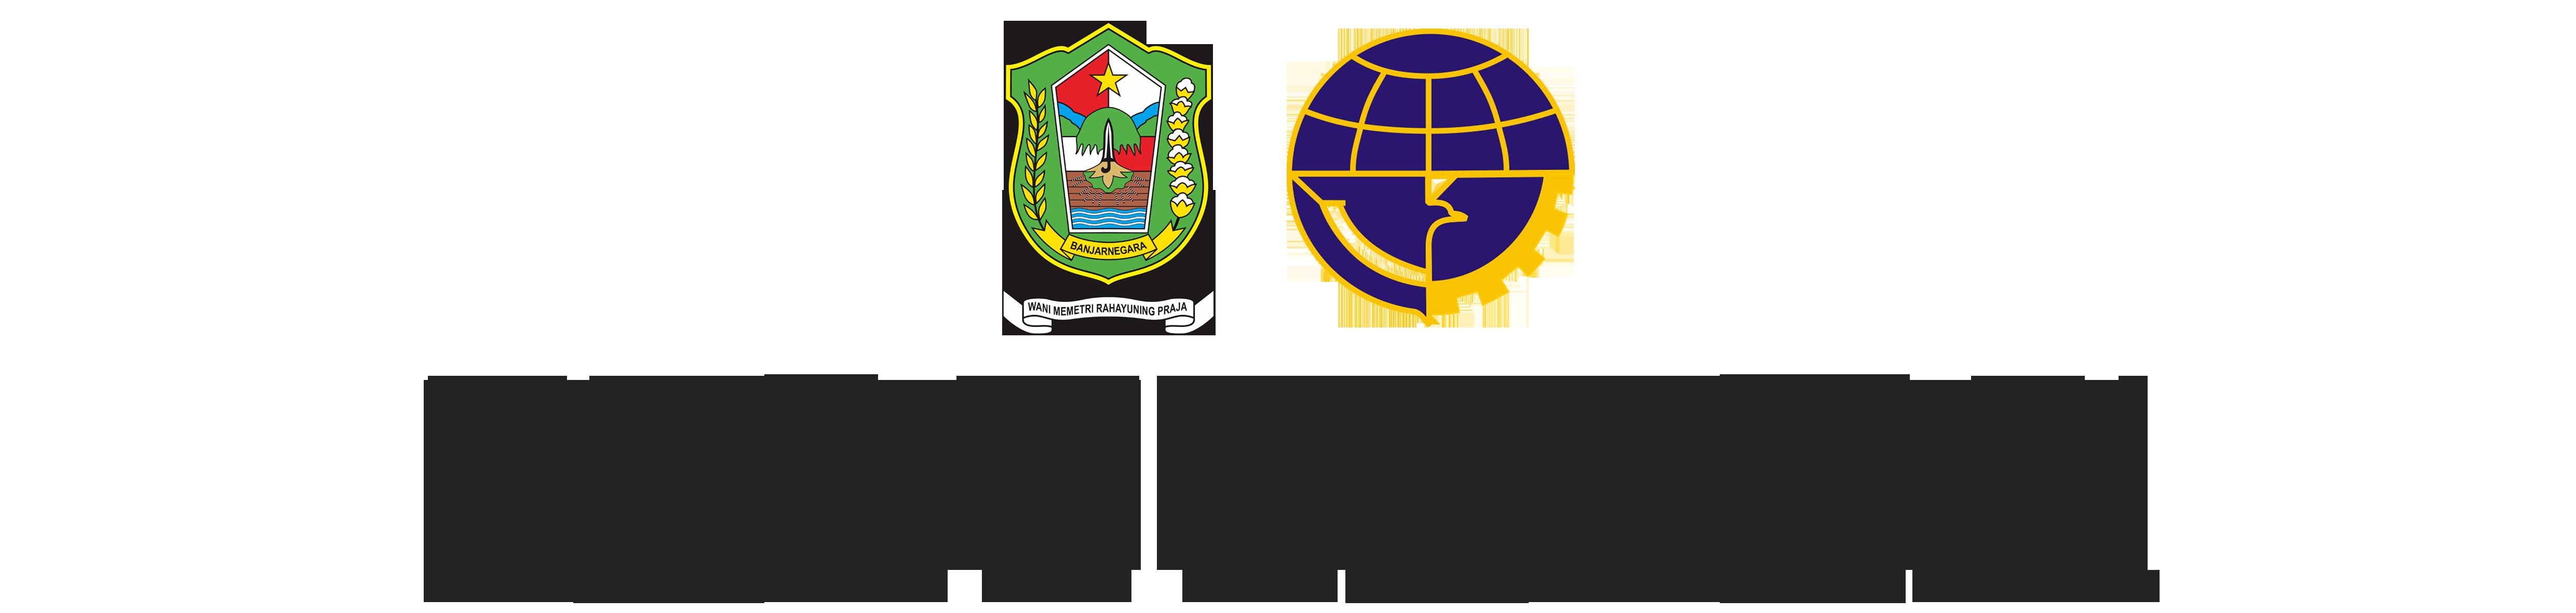 Dinas Perhubungan Kabupaten Banjarnegara